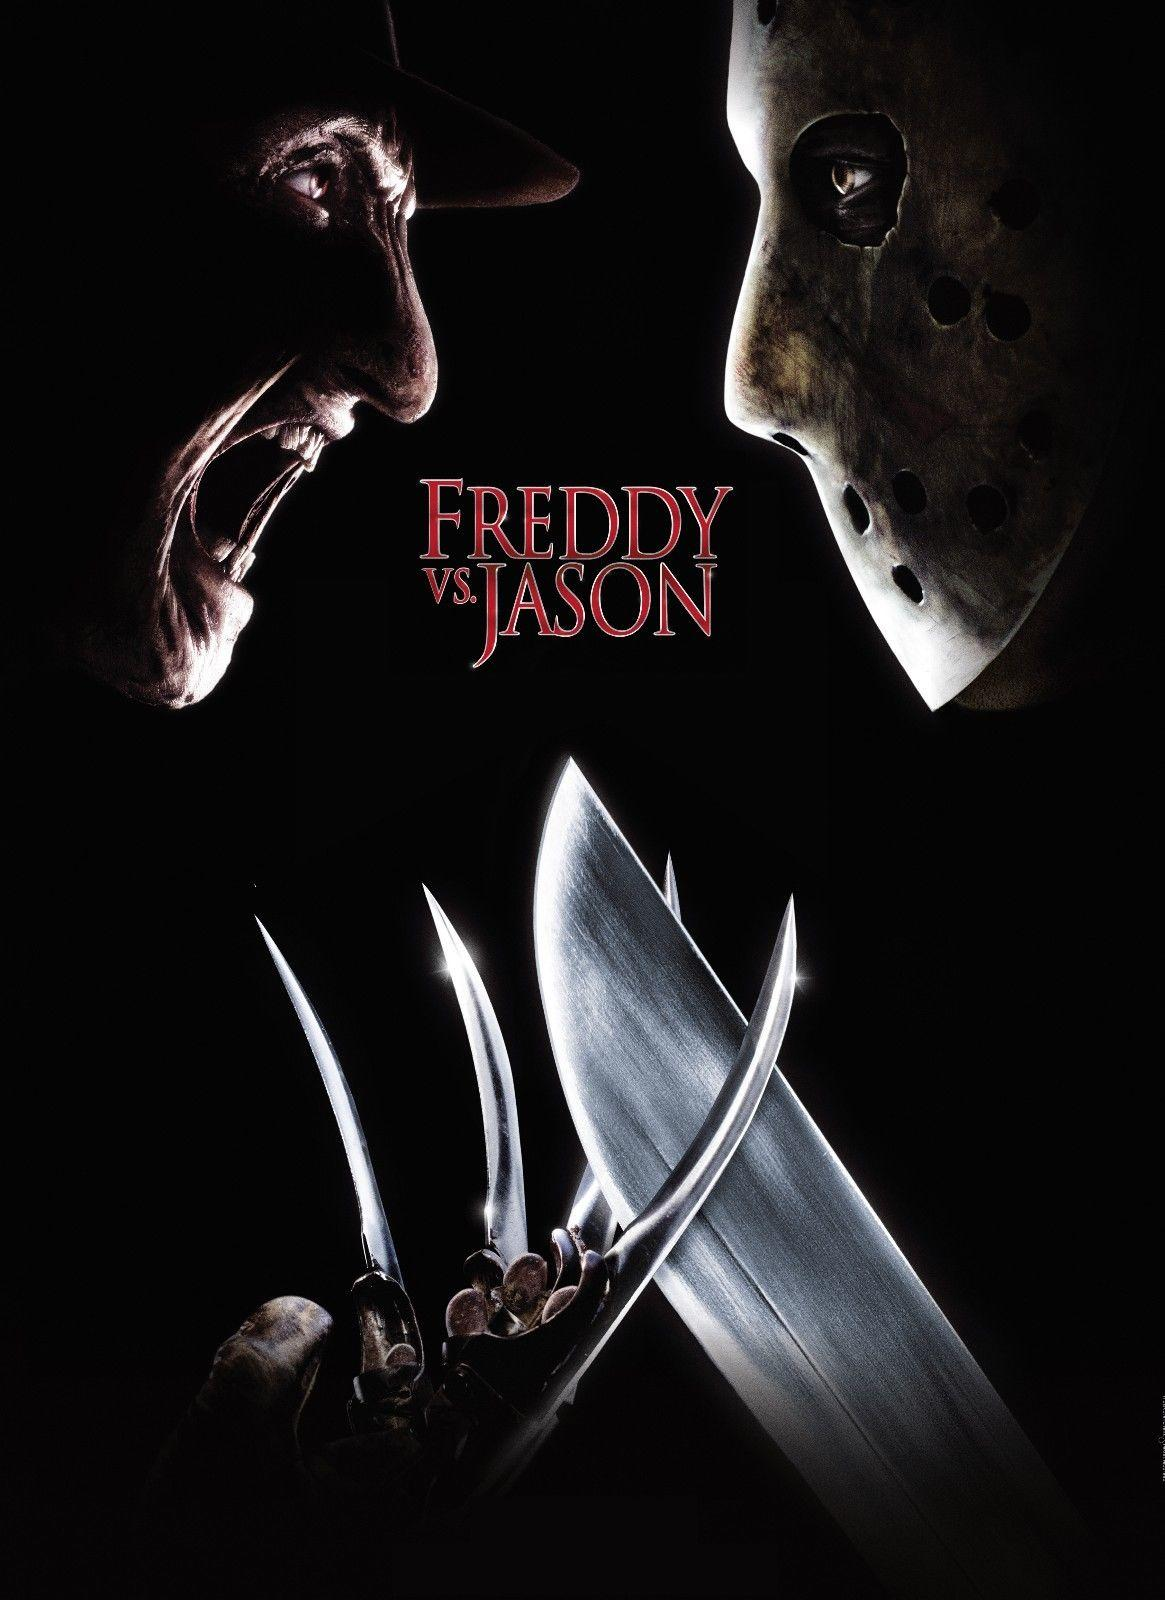 A NIGHTMARE ON ELM STREET Movie Horror Freddy Jason Art Silk Poster 24x36in A218